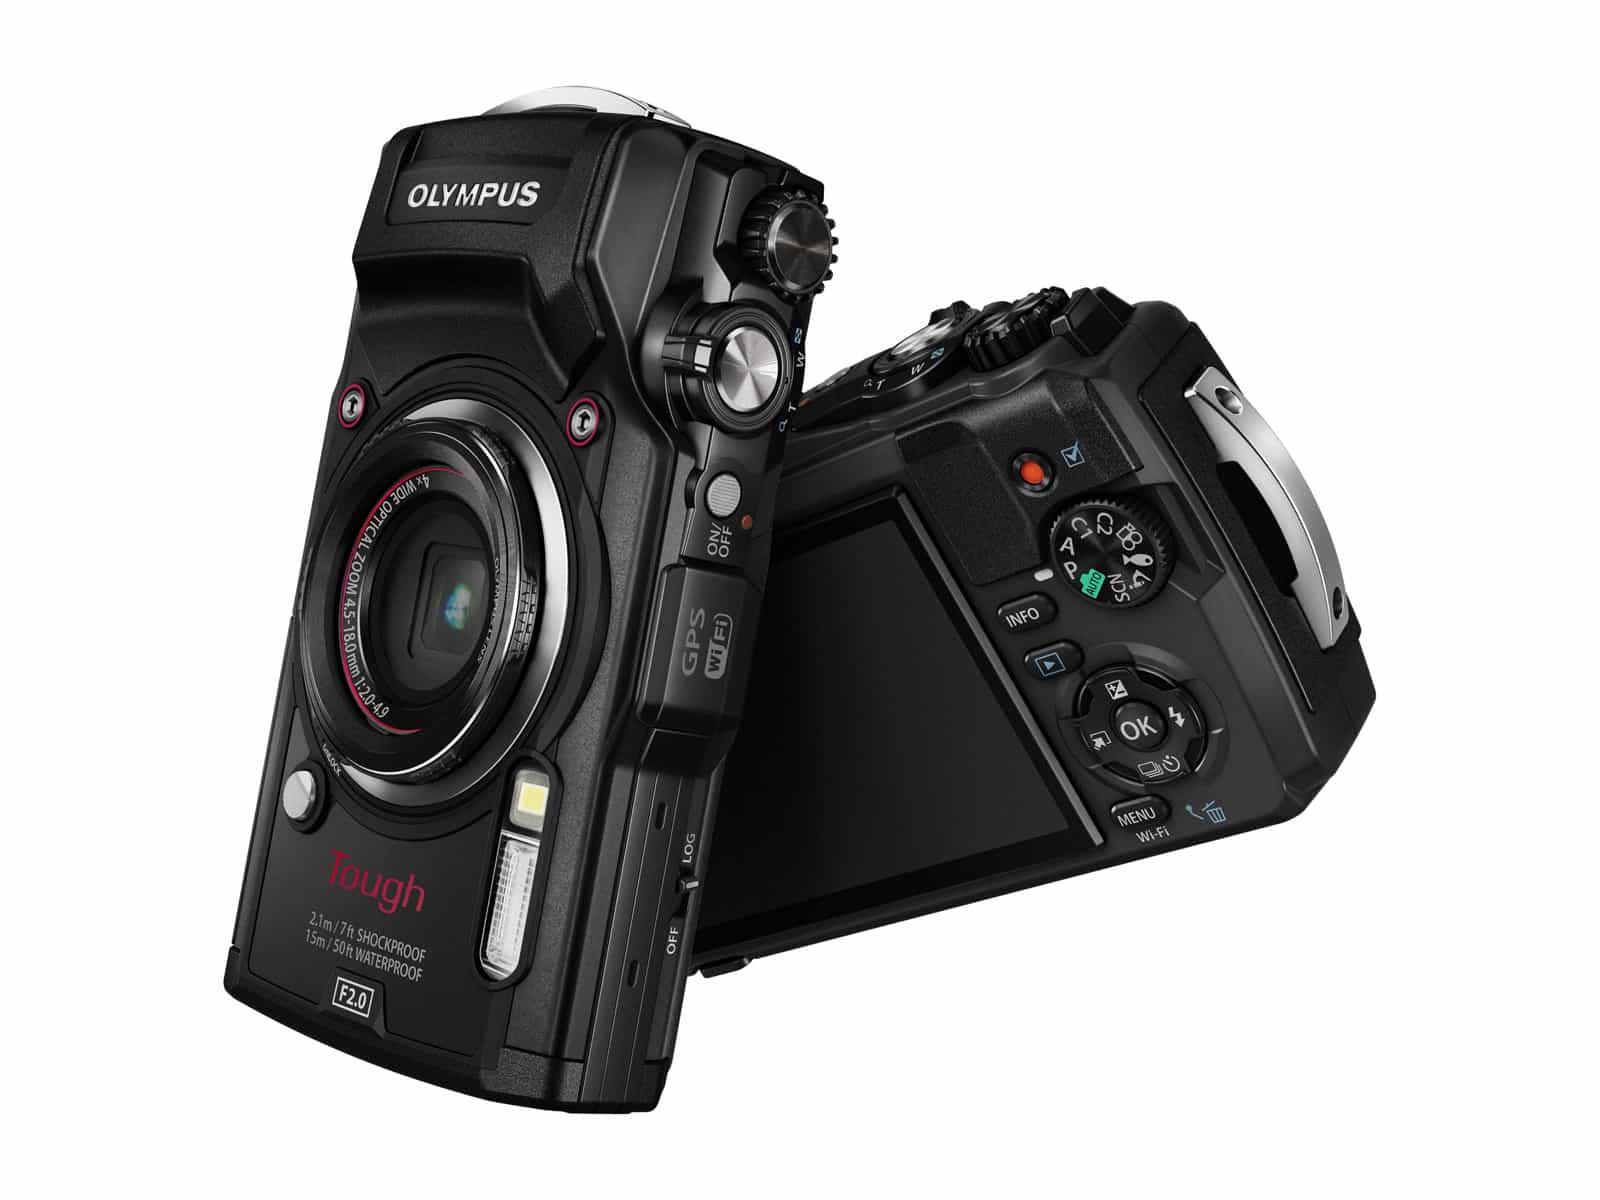 Olympus TG-5 sort - Nybrott Media AS